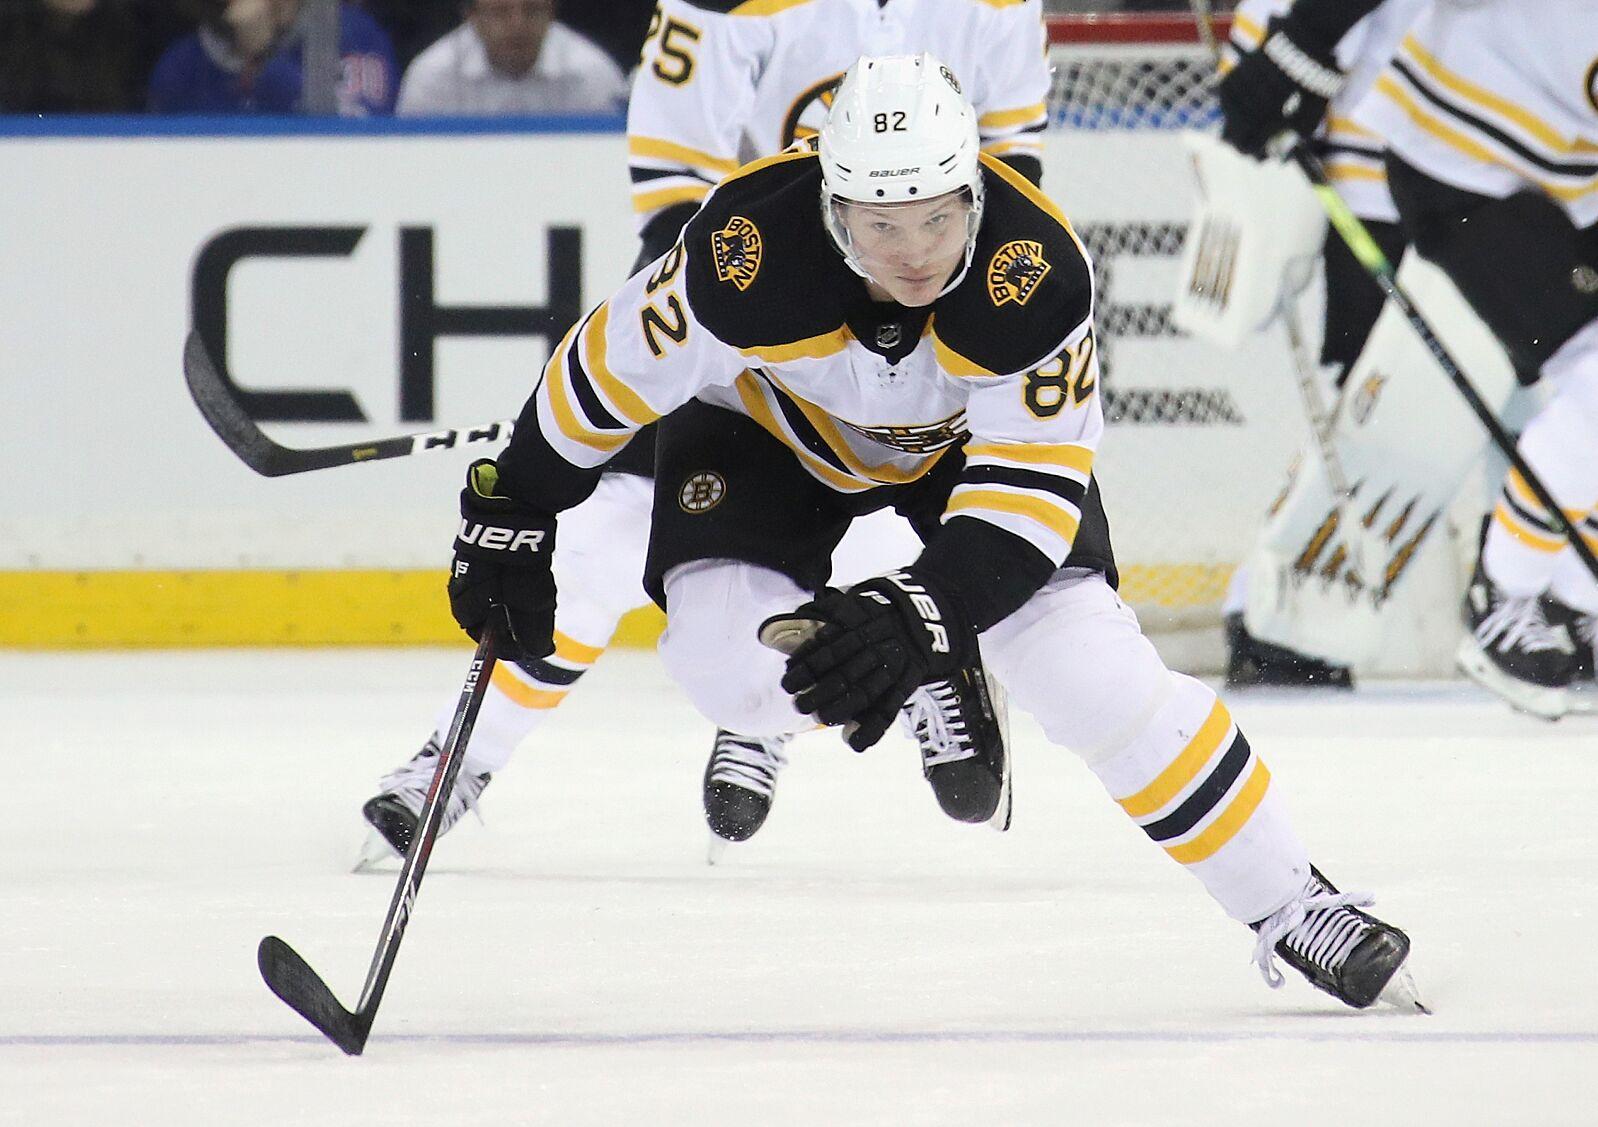 Boston Bruins: 3 takeaways from successful road trip